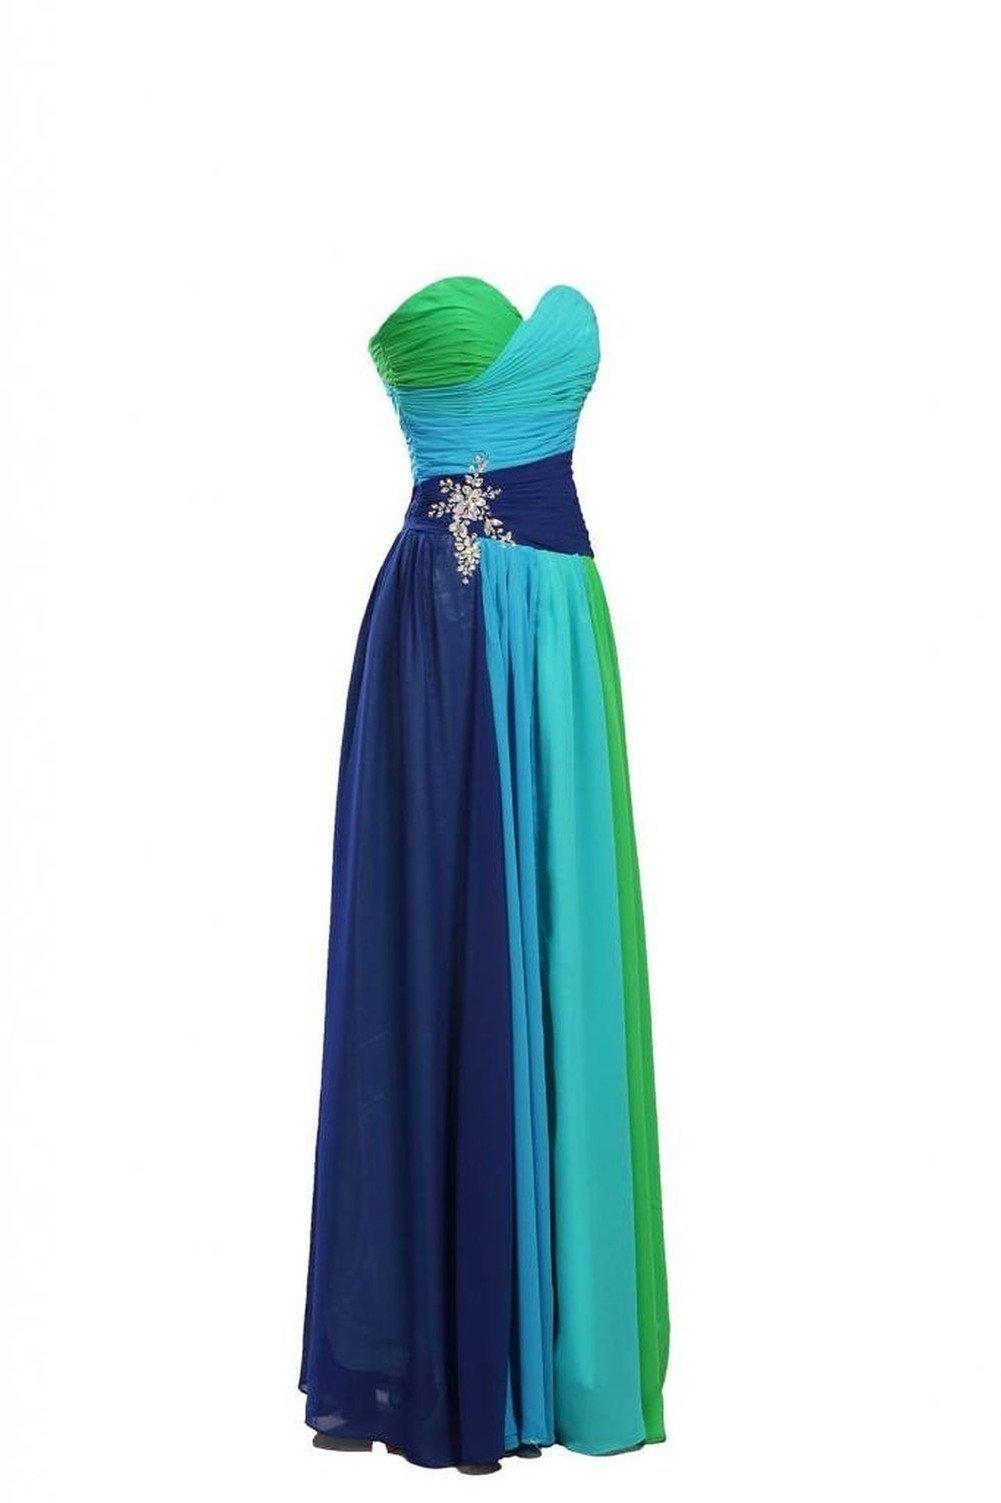 Dormencir Women's Rhinestone Colorful Long Bridesmaid Prom Evening Dresses (12) by Dormencir (Image #3)